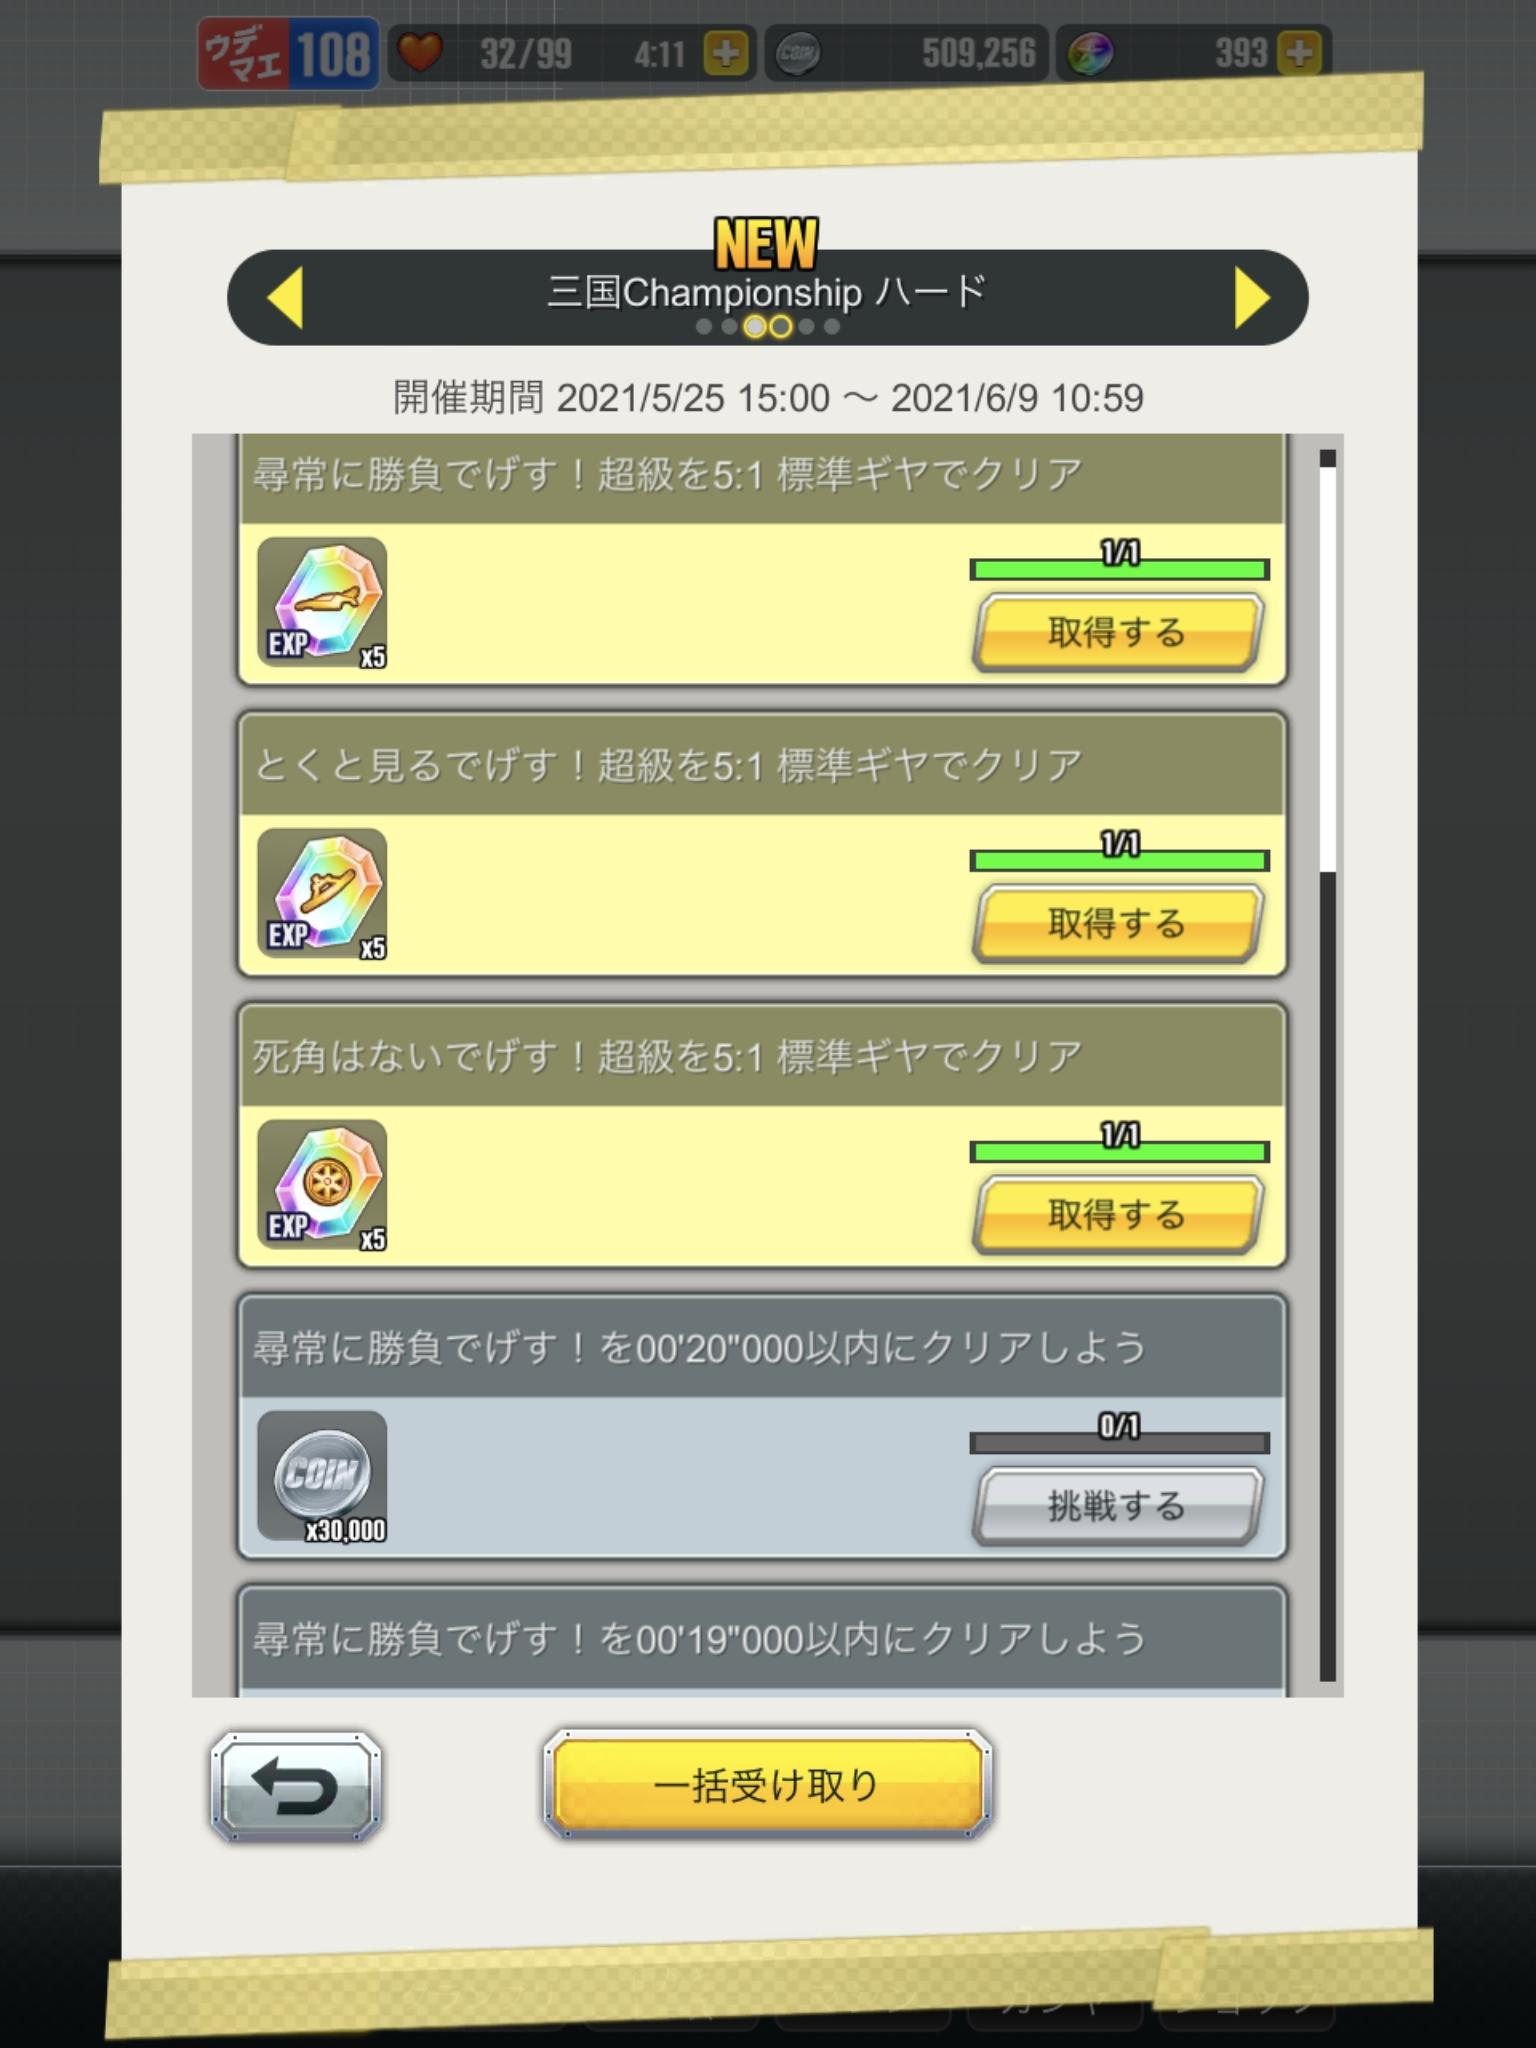 /theme/dengekionline/mini4wd/images/limited/Mikuni_Championship/01